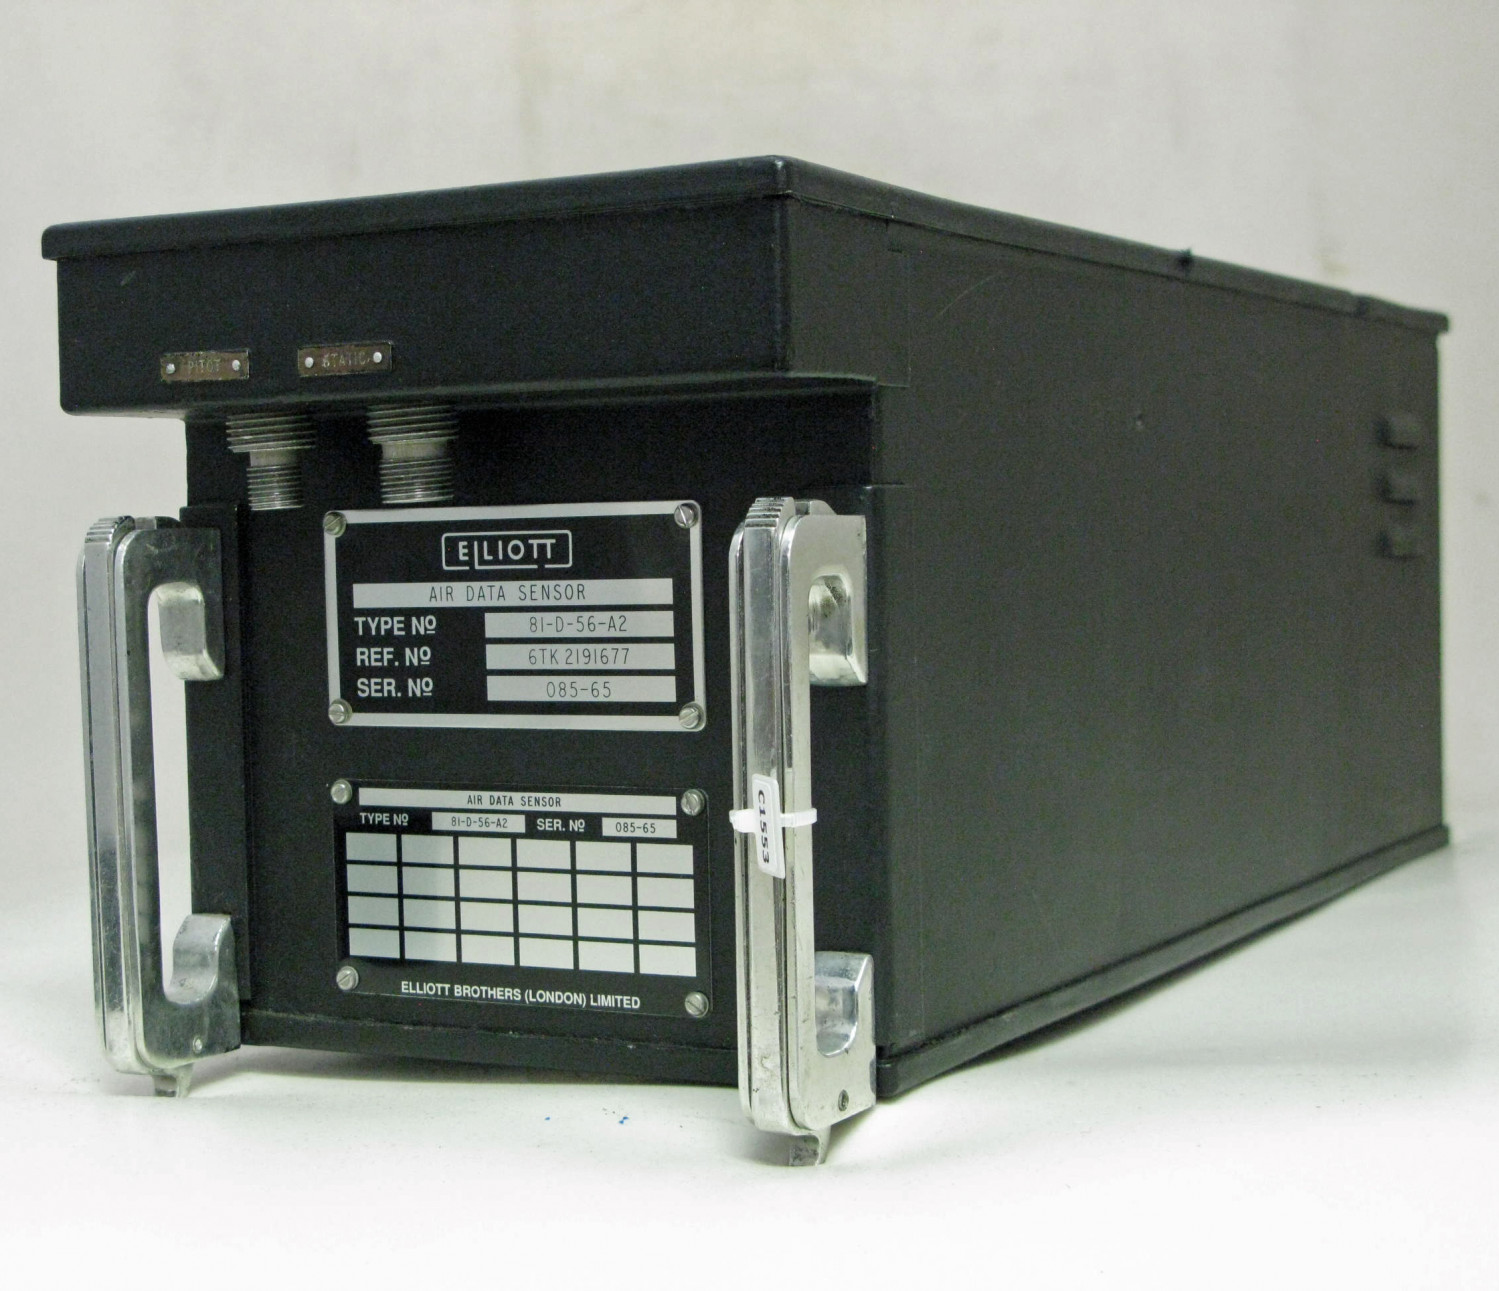 VC10 Air Data Sensor